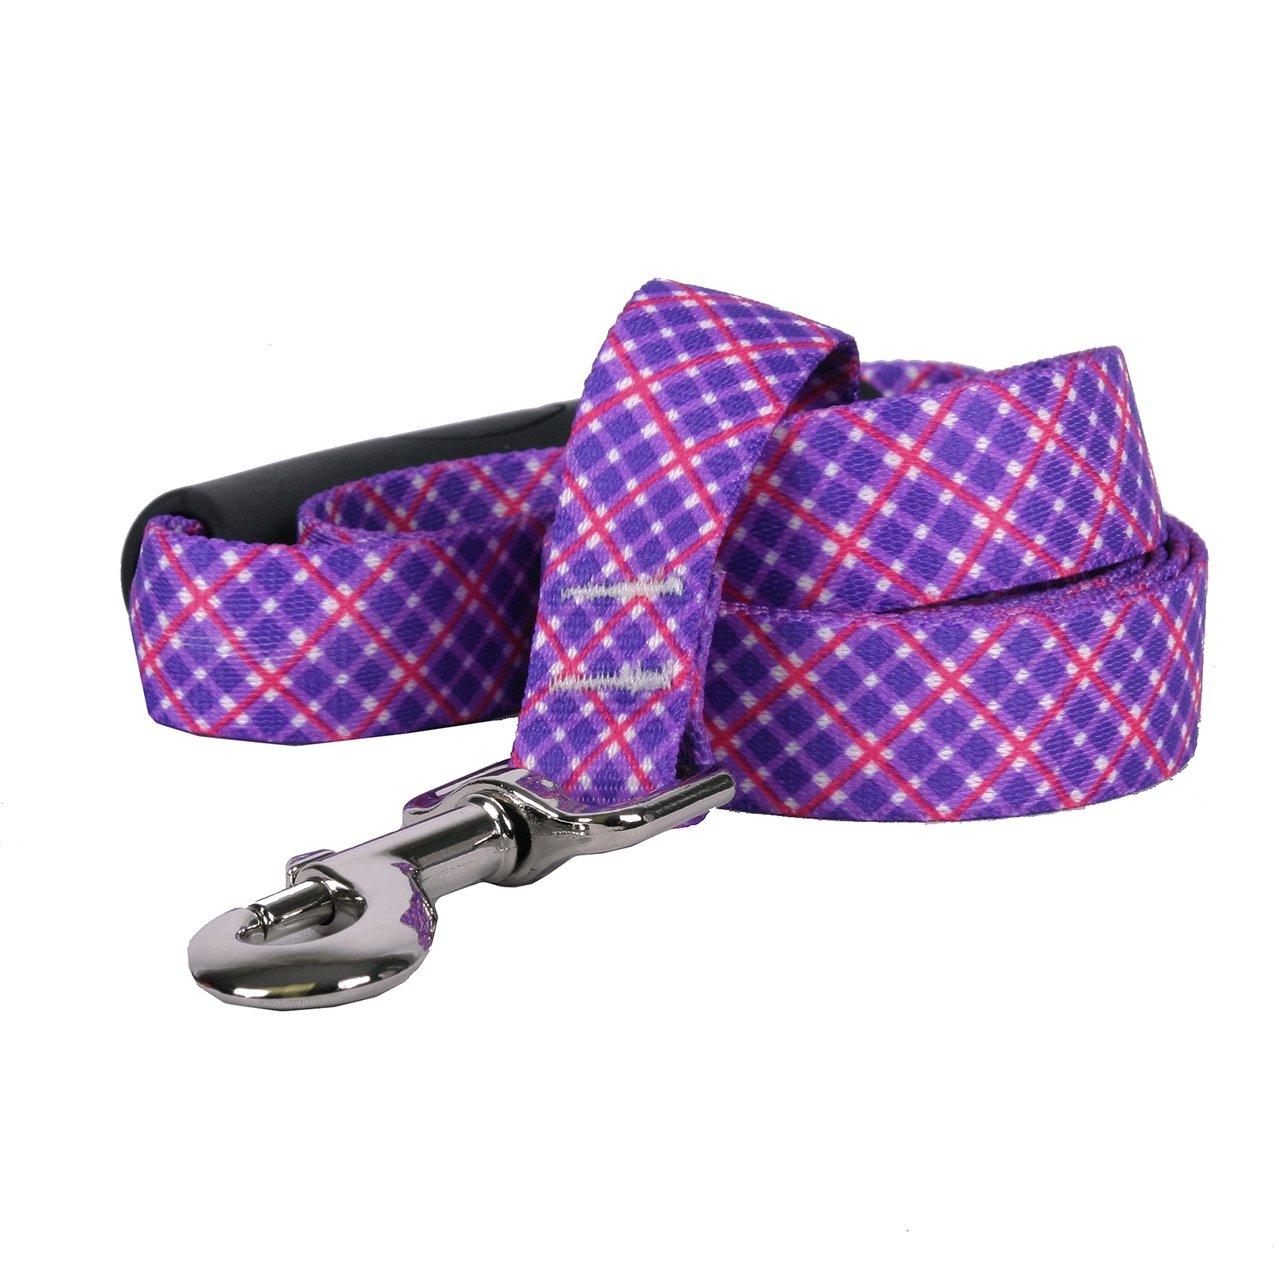 Yellow Dog Design Purple Pink Diagonal Plaid EZ-Grip Dog Leash, Small/Medium-3/4 Wide 5' (60'') Long by Yellow Dog Design (Image #1)